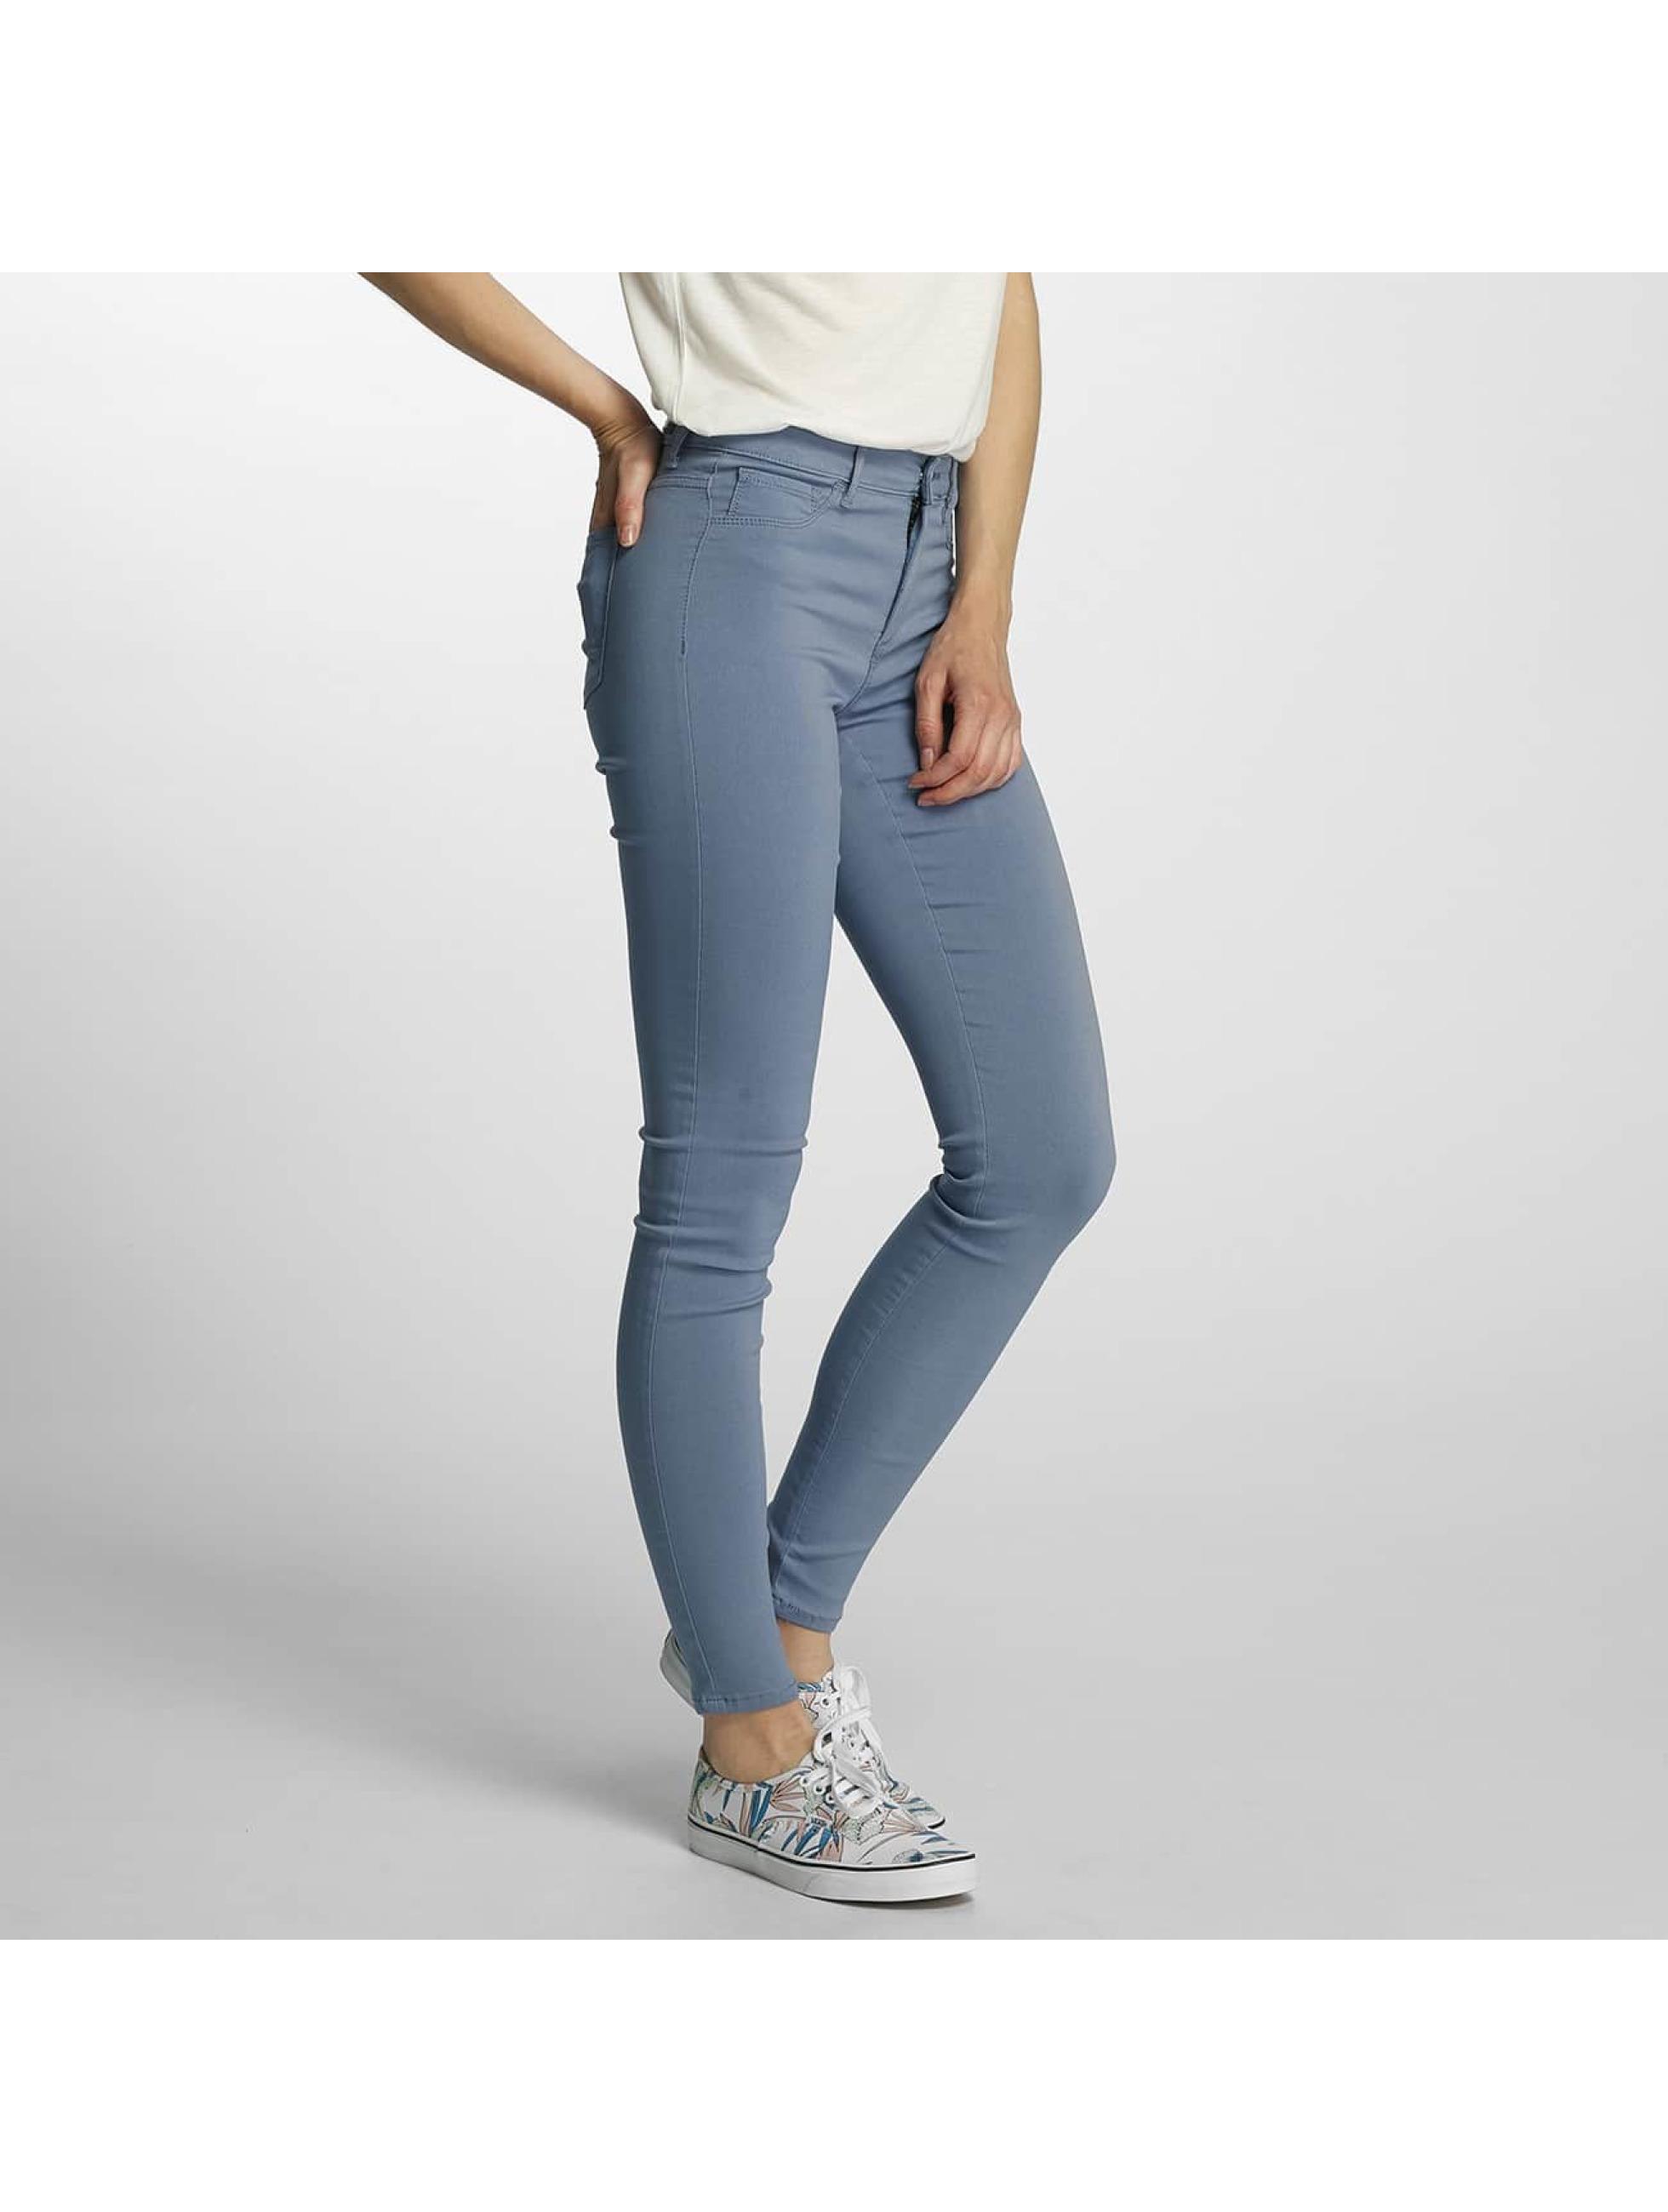 Pieces Frauen Legging pcSkin Wear in blau